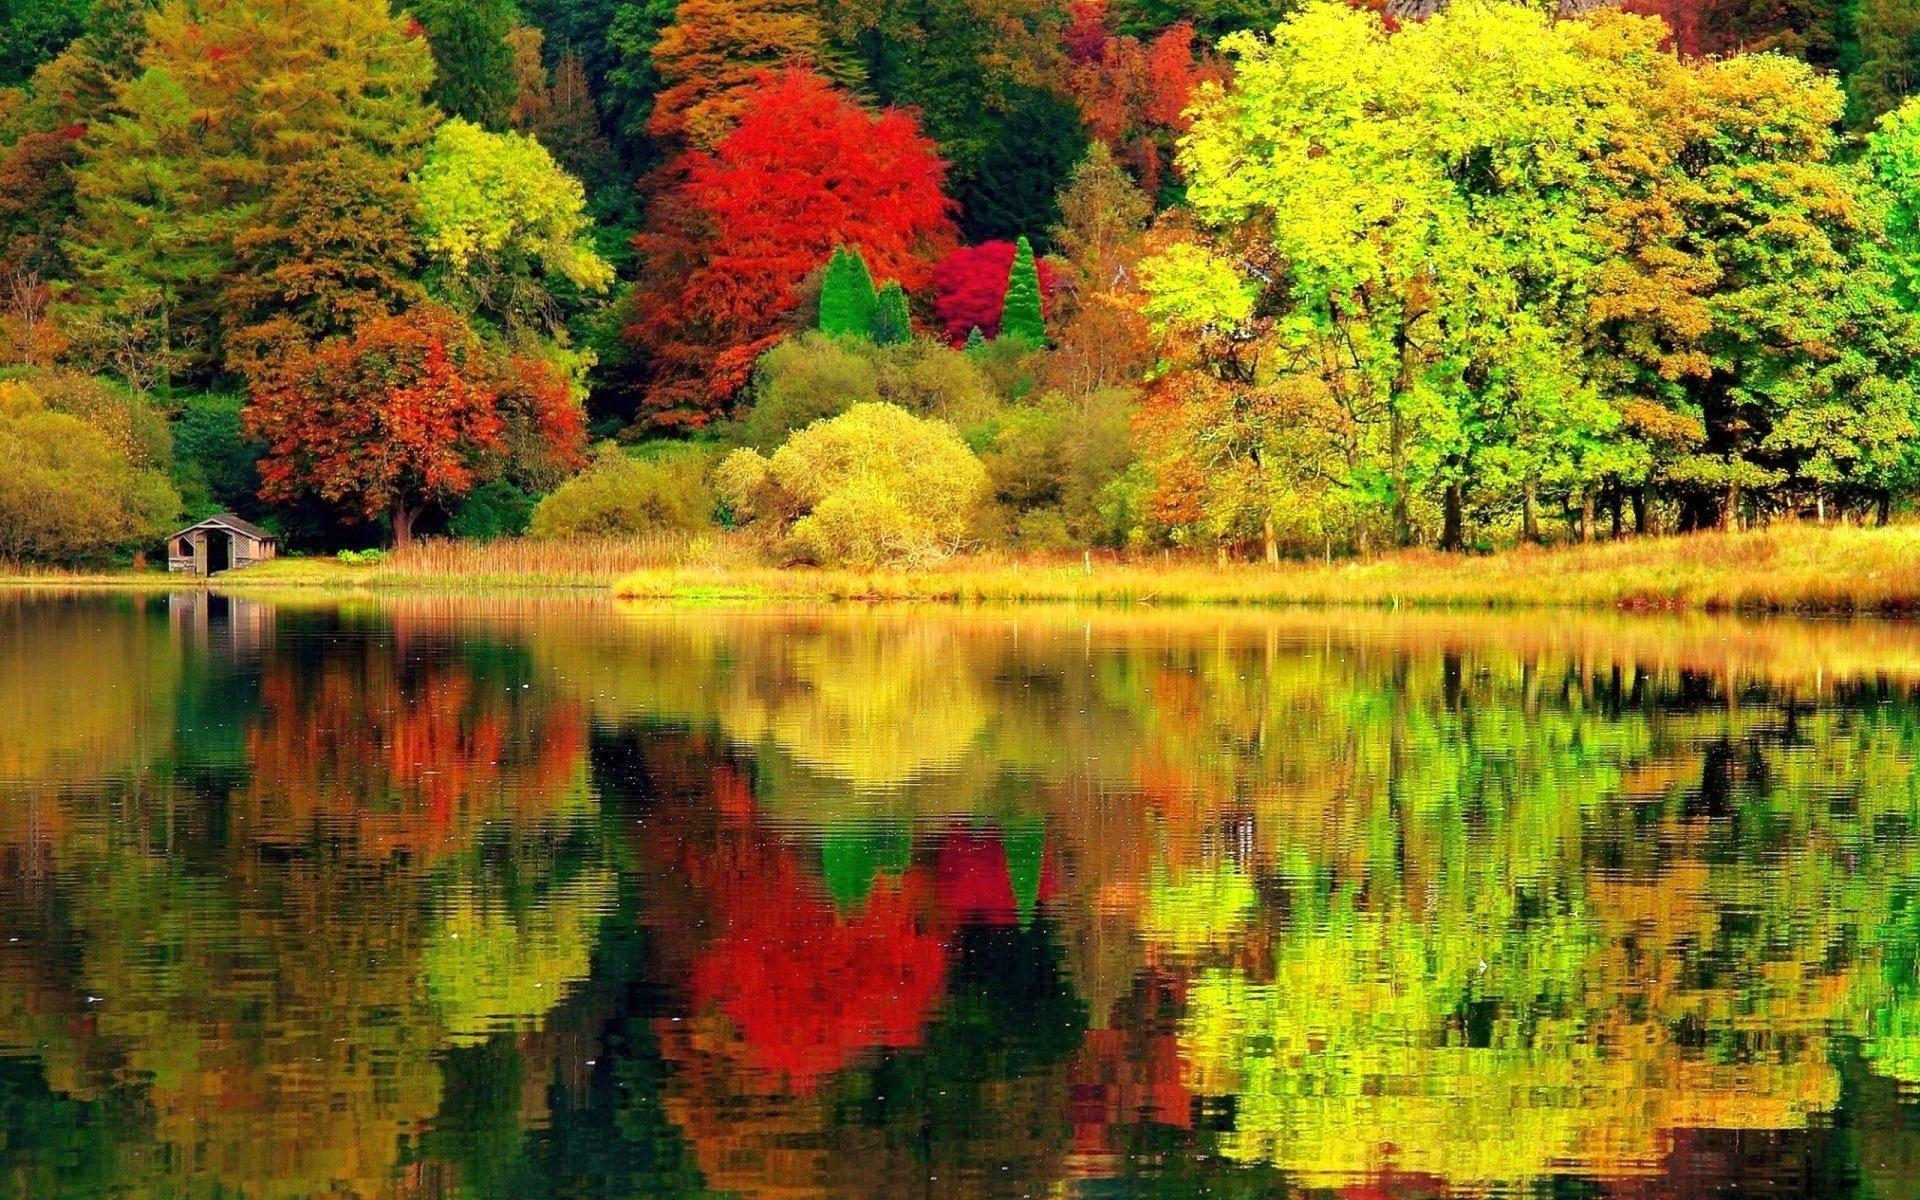 autumn lake HD Wallpaper | Background Image | 2560x1600 ...